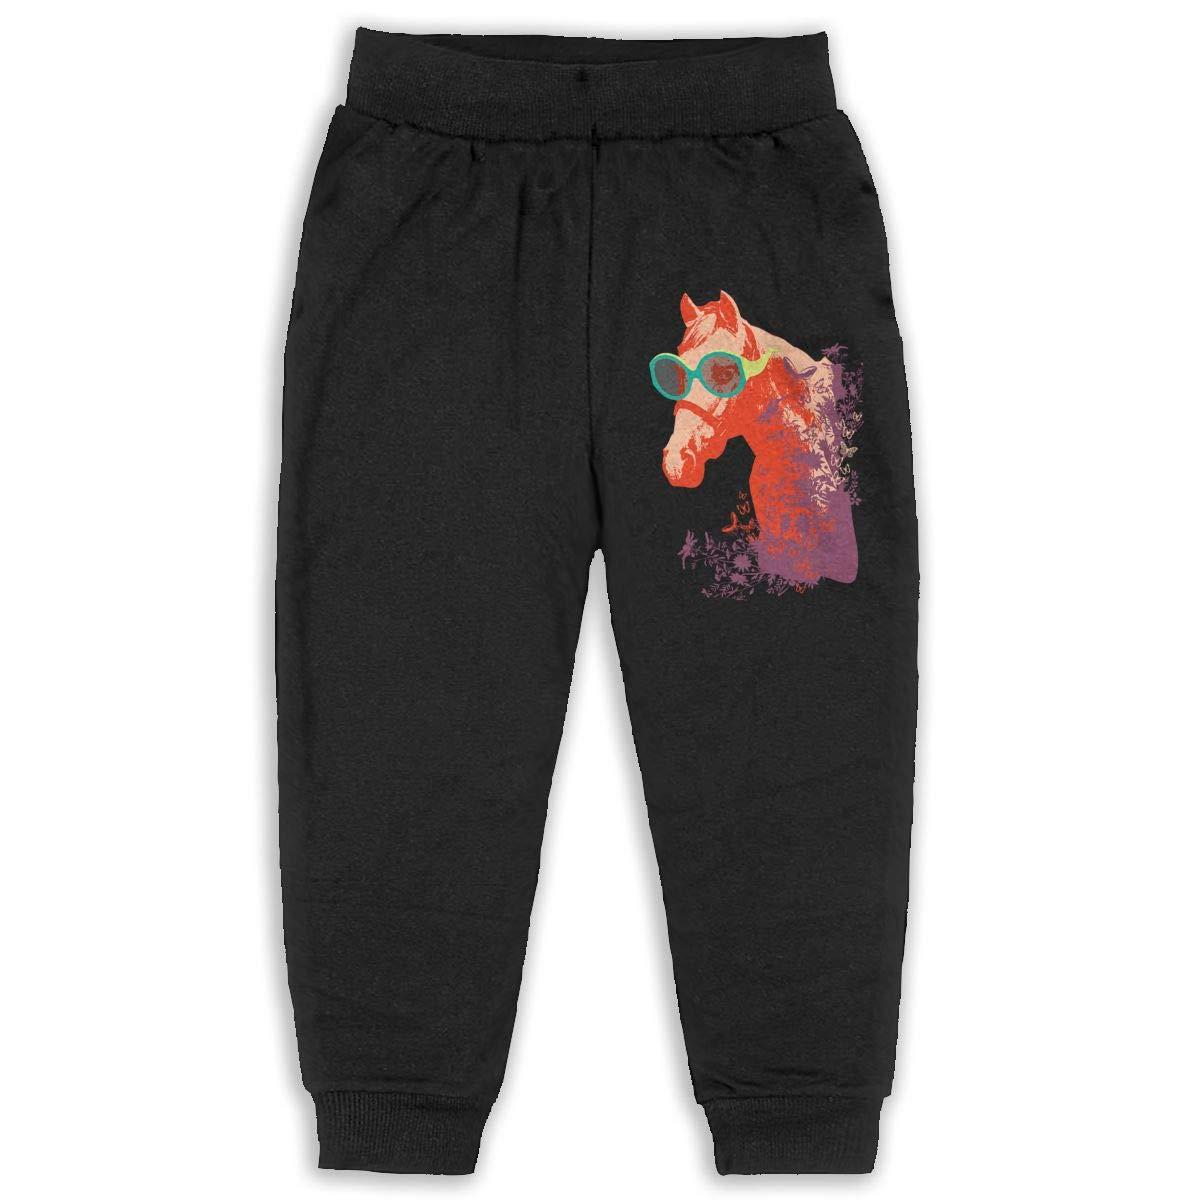 Uyikuvt Sweatpants Funny Sunglass Horse Pattern Cotton Toddler Active Jogger Full-Length Regular Size Pants Kids